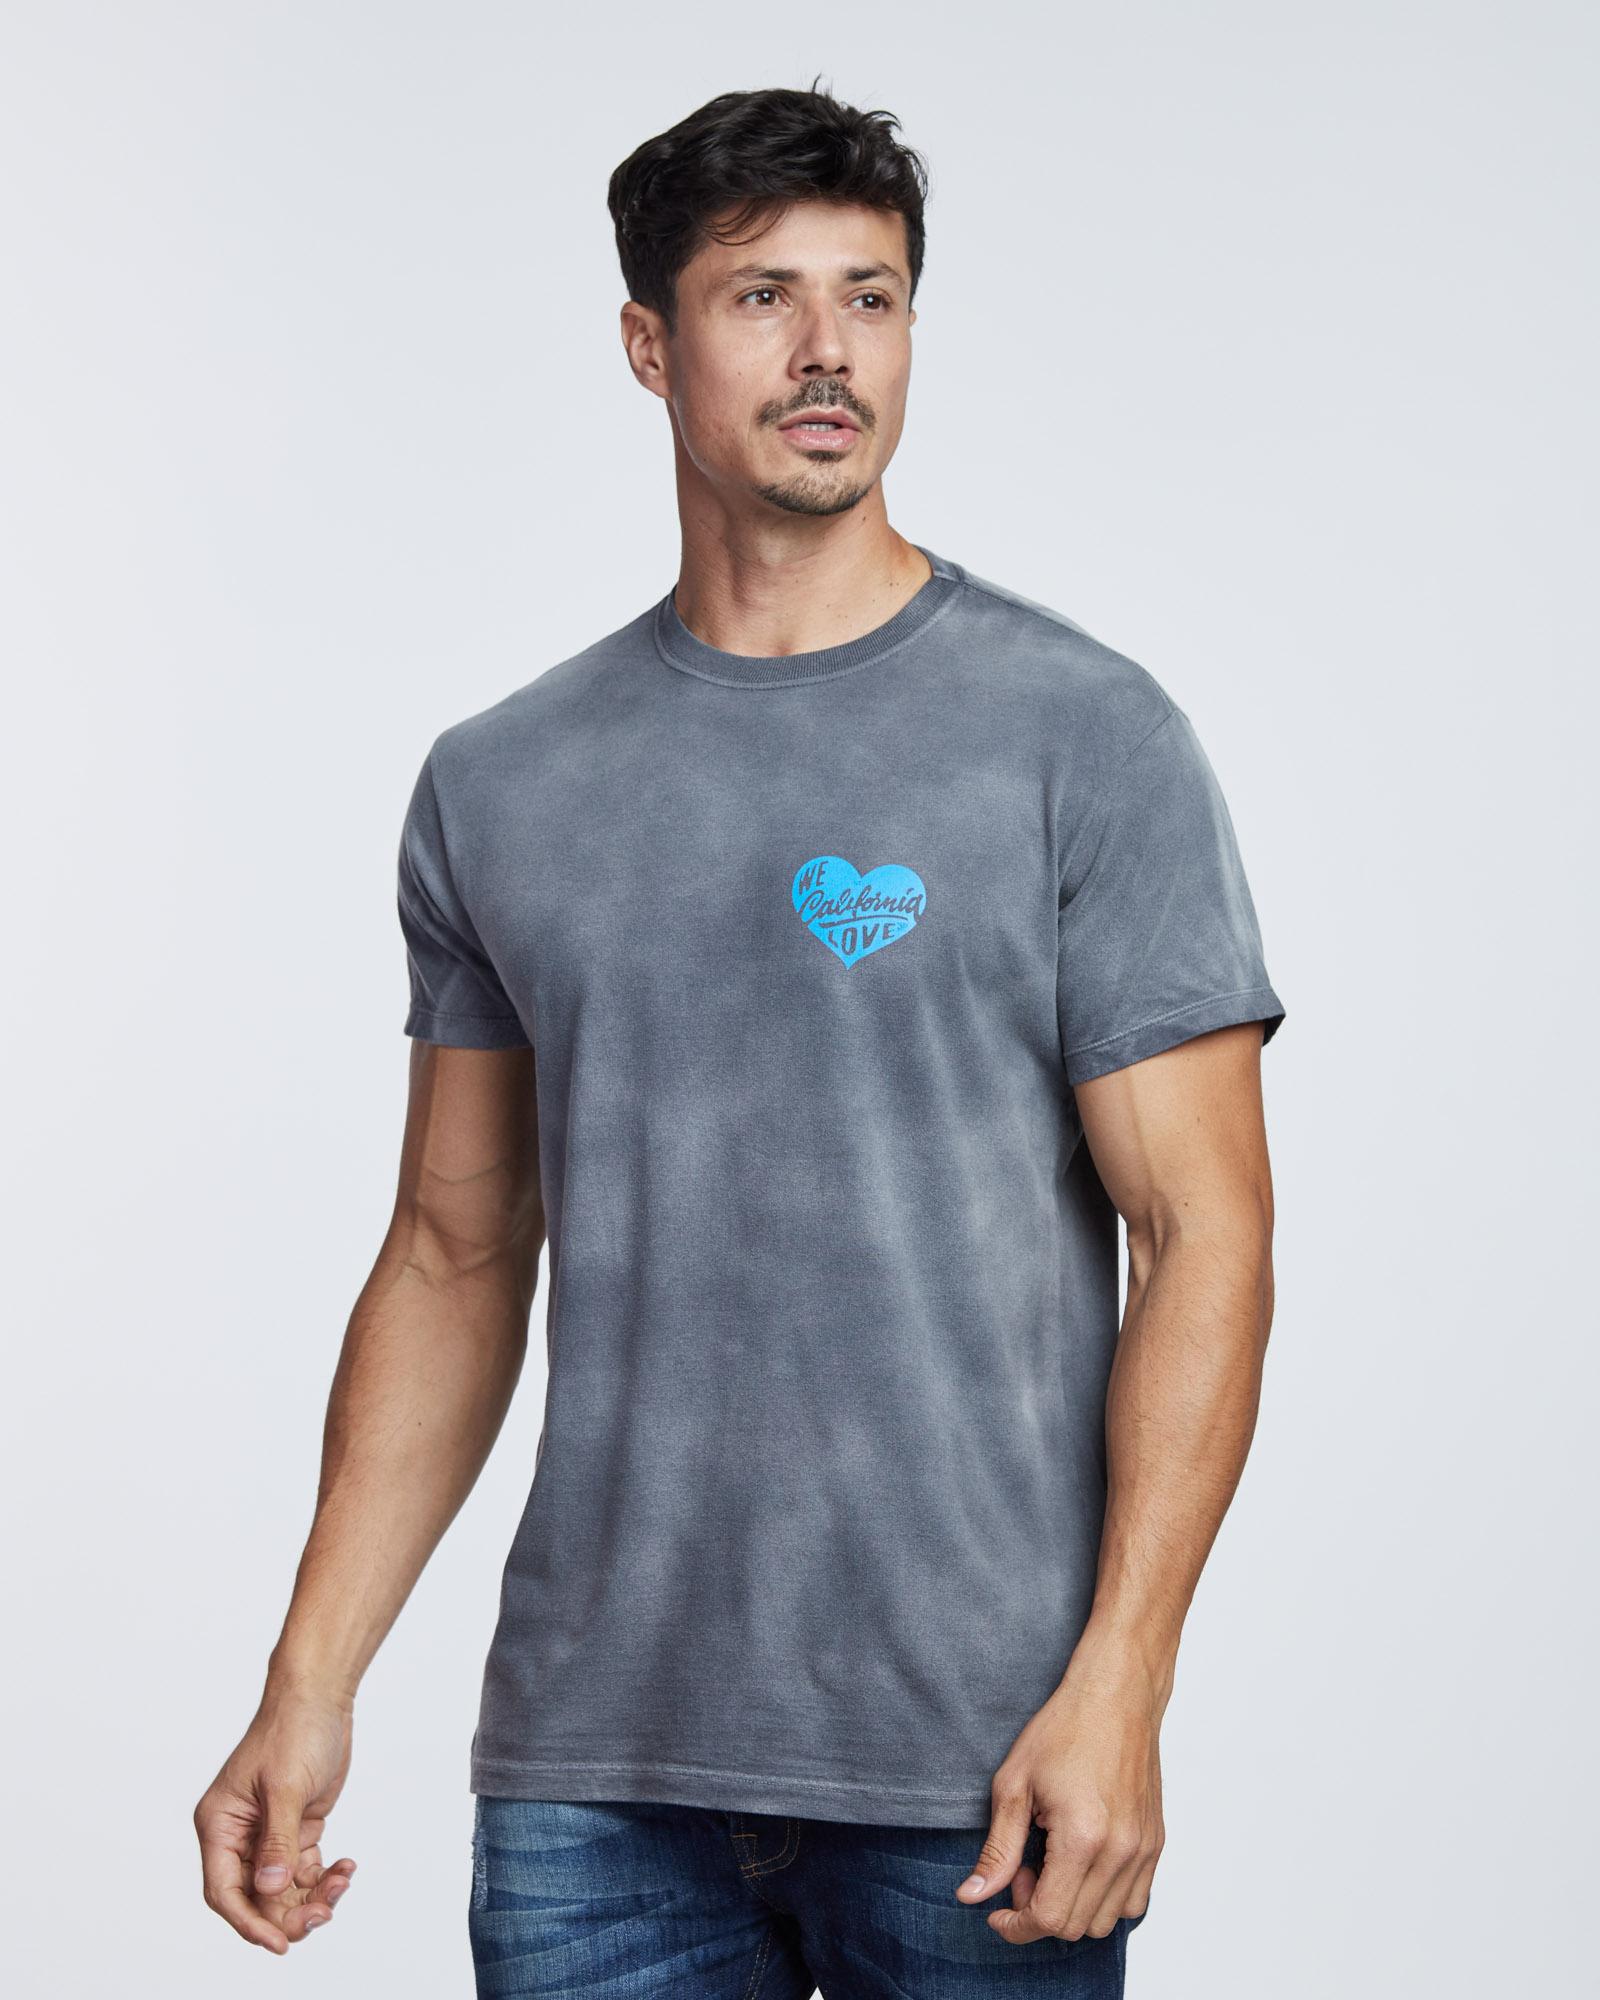 Camiseta We Love Califa Masculina Evolvee